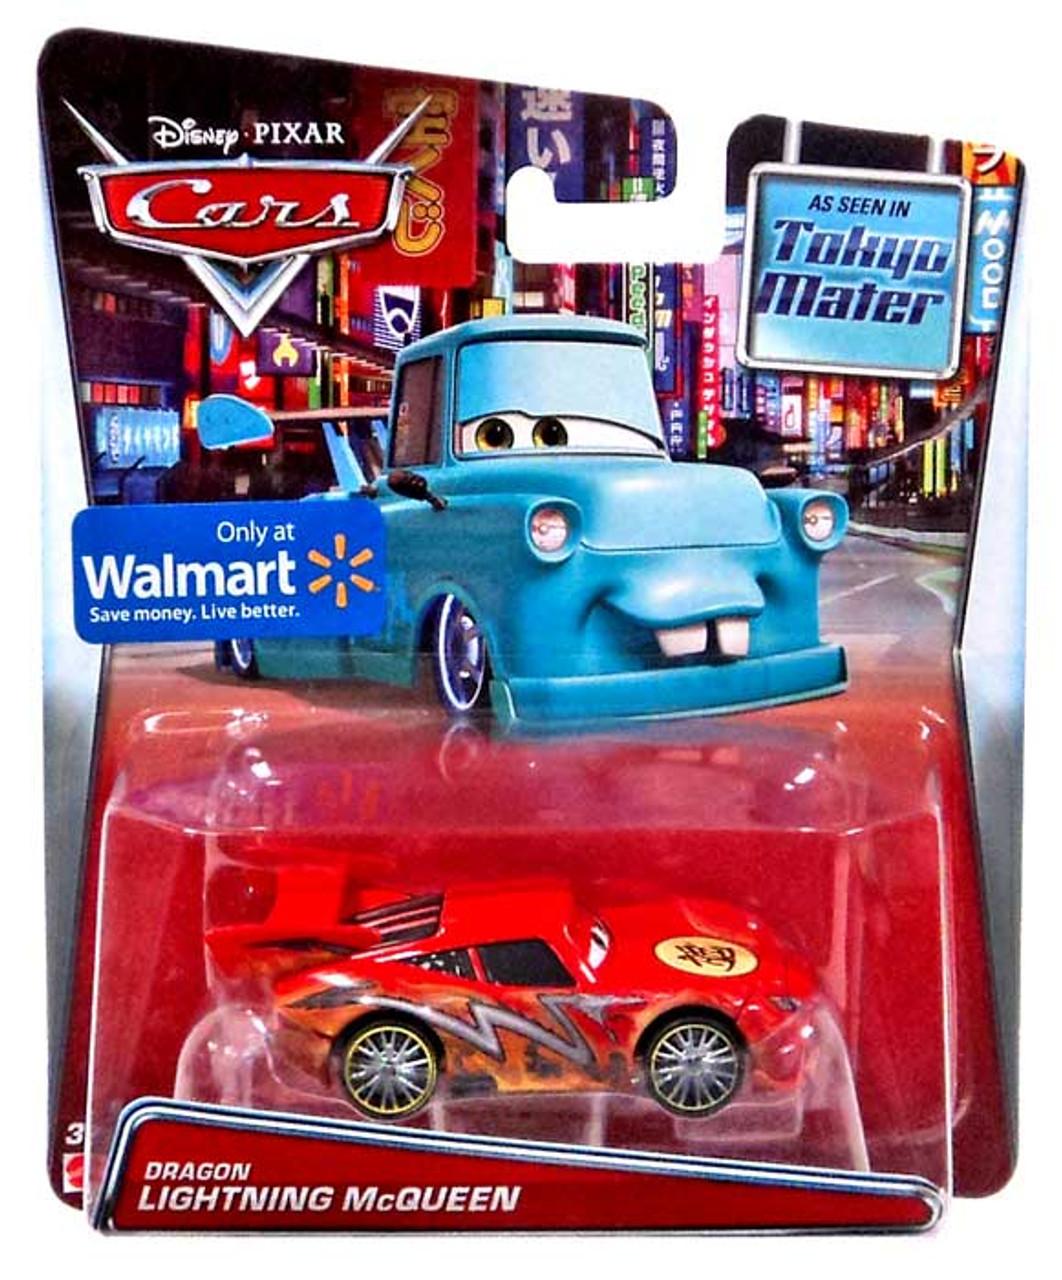 disney pixar cars dragon lightning mcqueen exclusive 155 diecast car